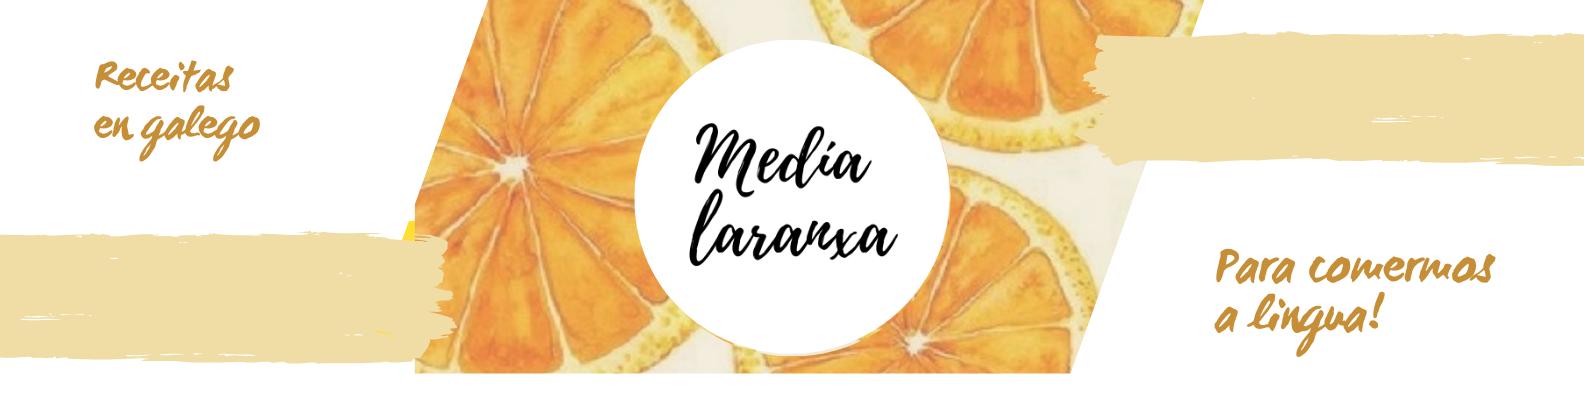 Media laranxa